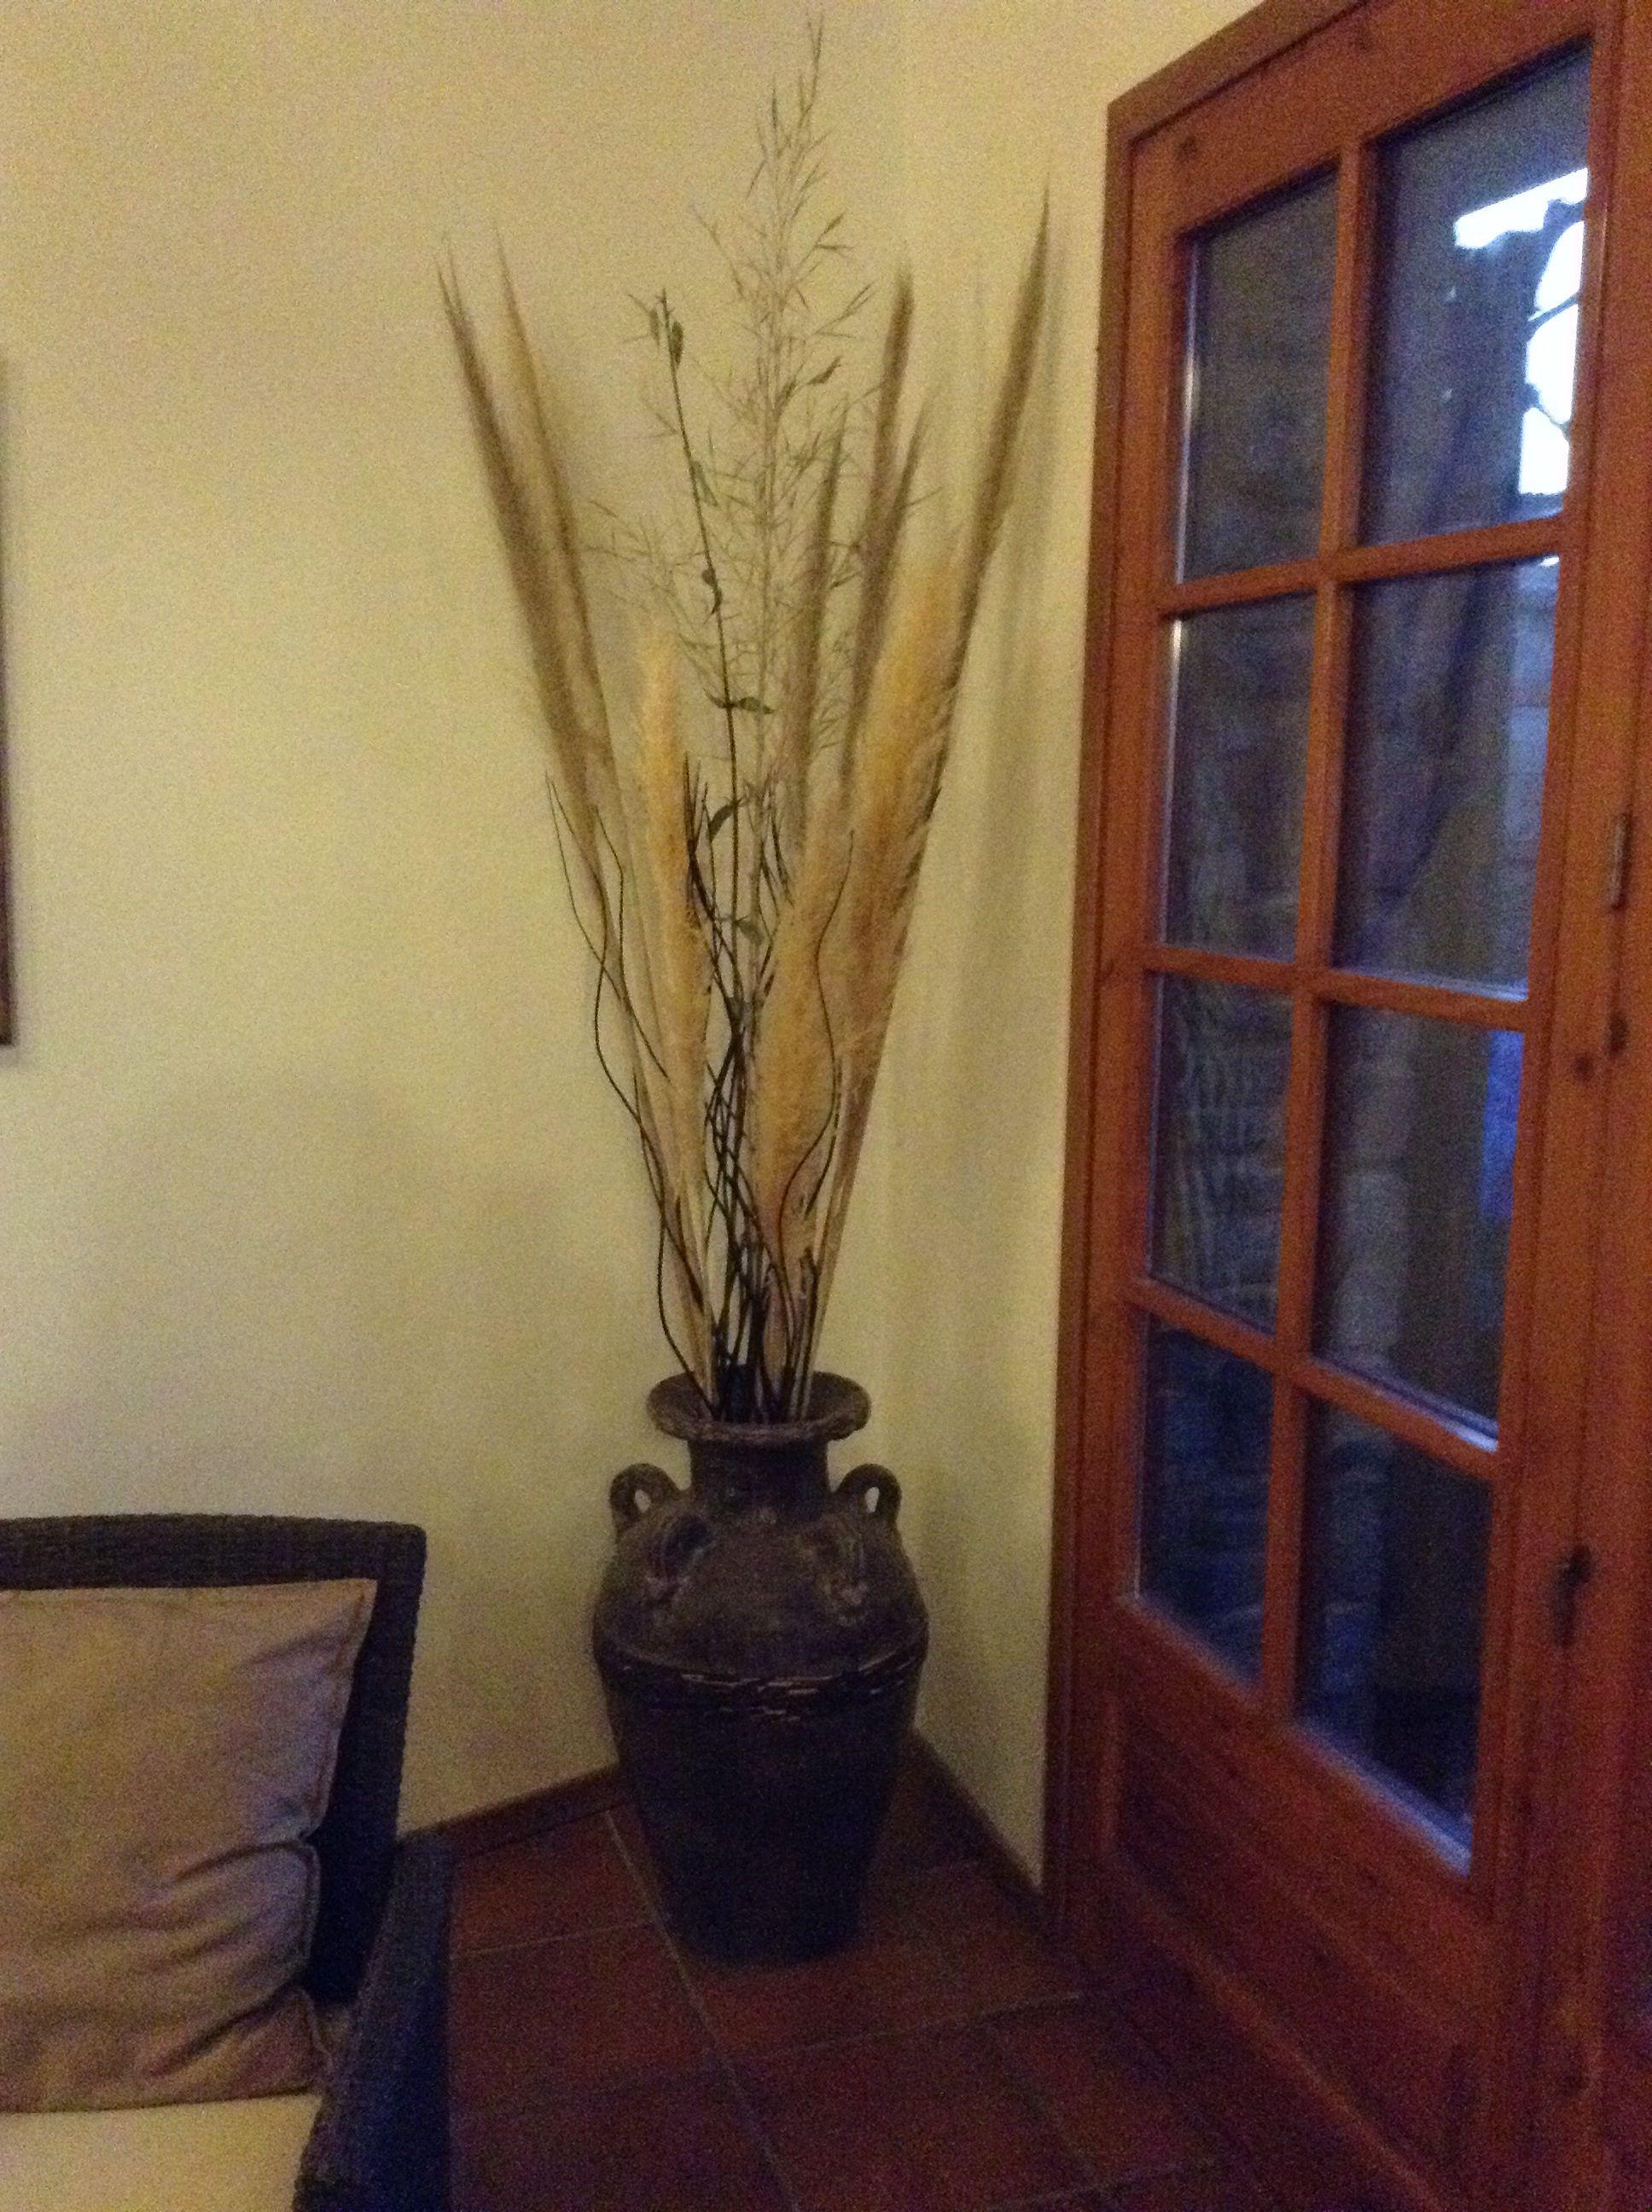 Vasija con flores secas jarrones de flores secas - Adornos flores secas ...